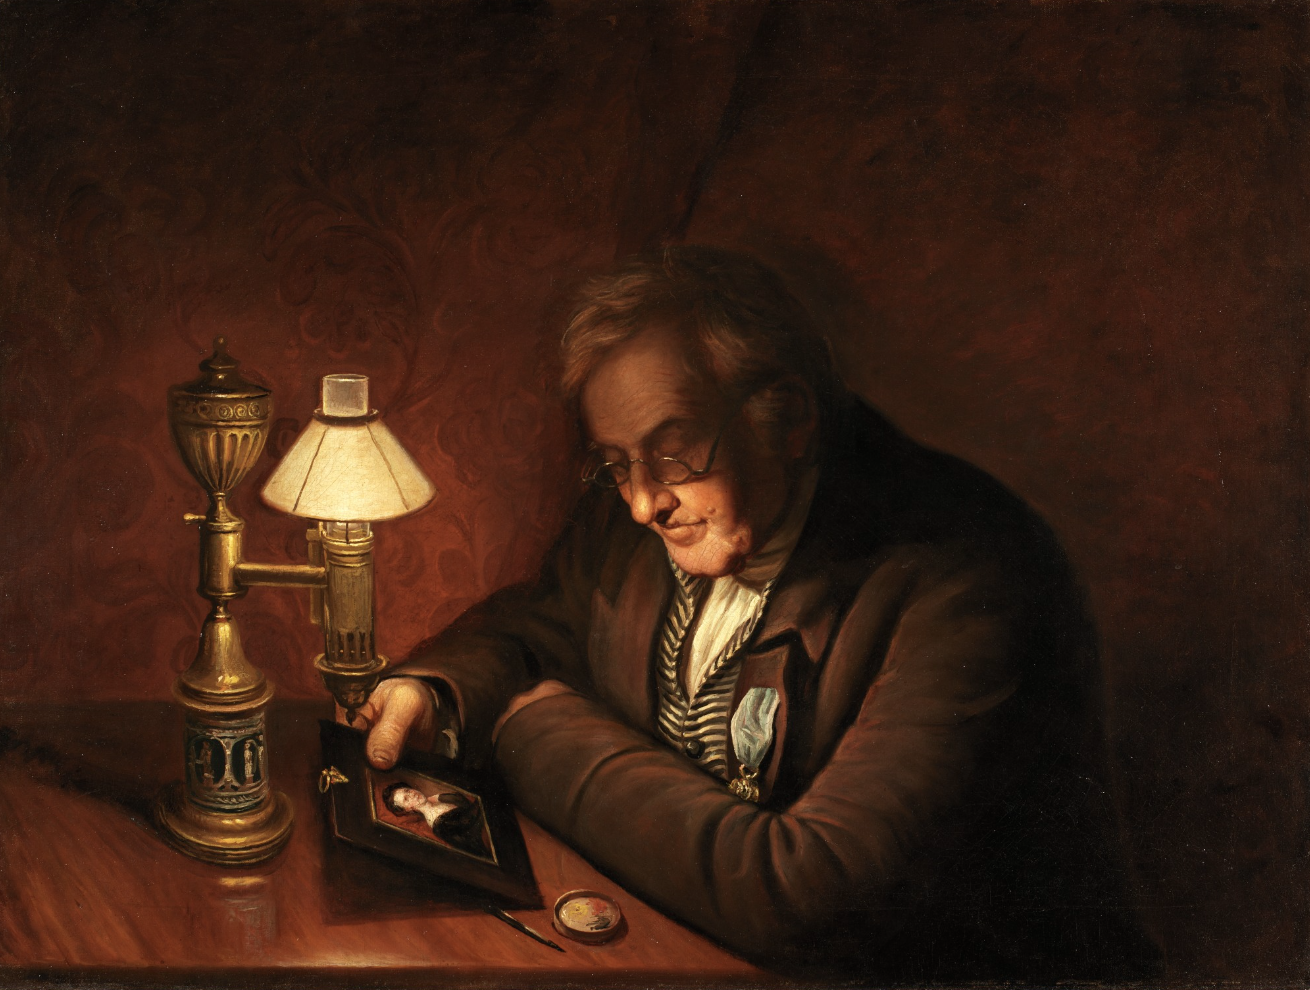 Antoine Quinquet et le quinquet à l'huile